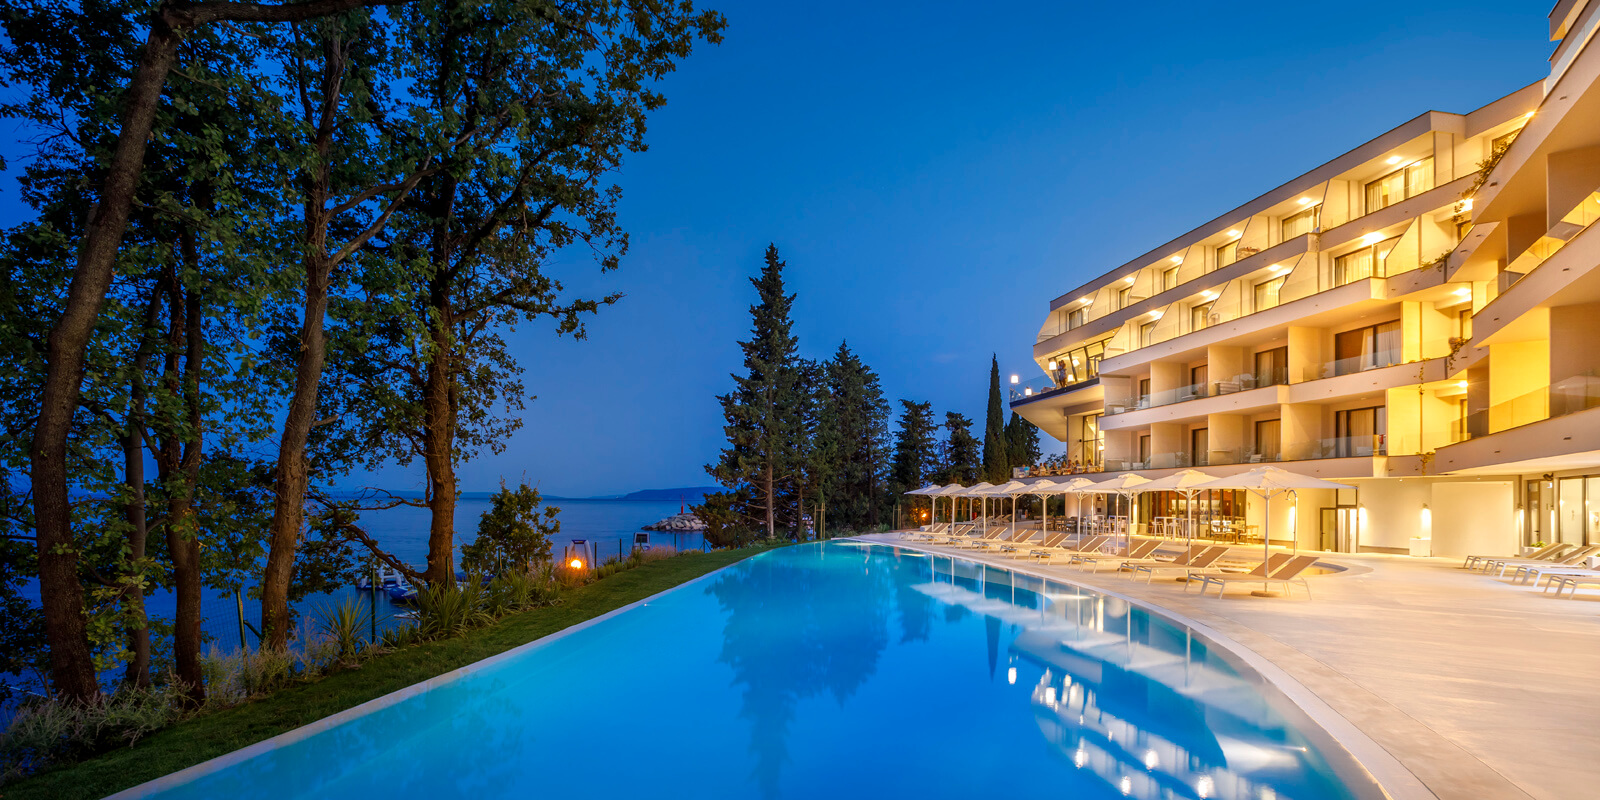 Remisens Hotel Giorgio Ii Icici Croatia Remisens Hotels